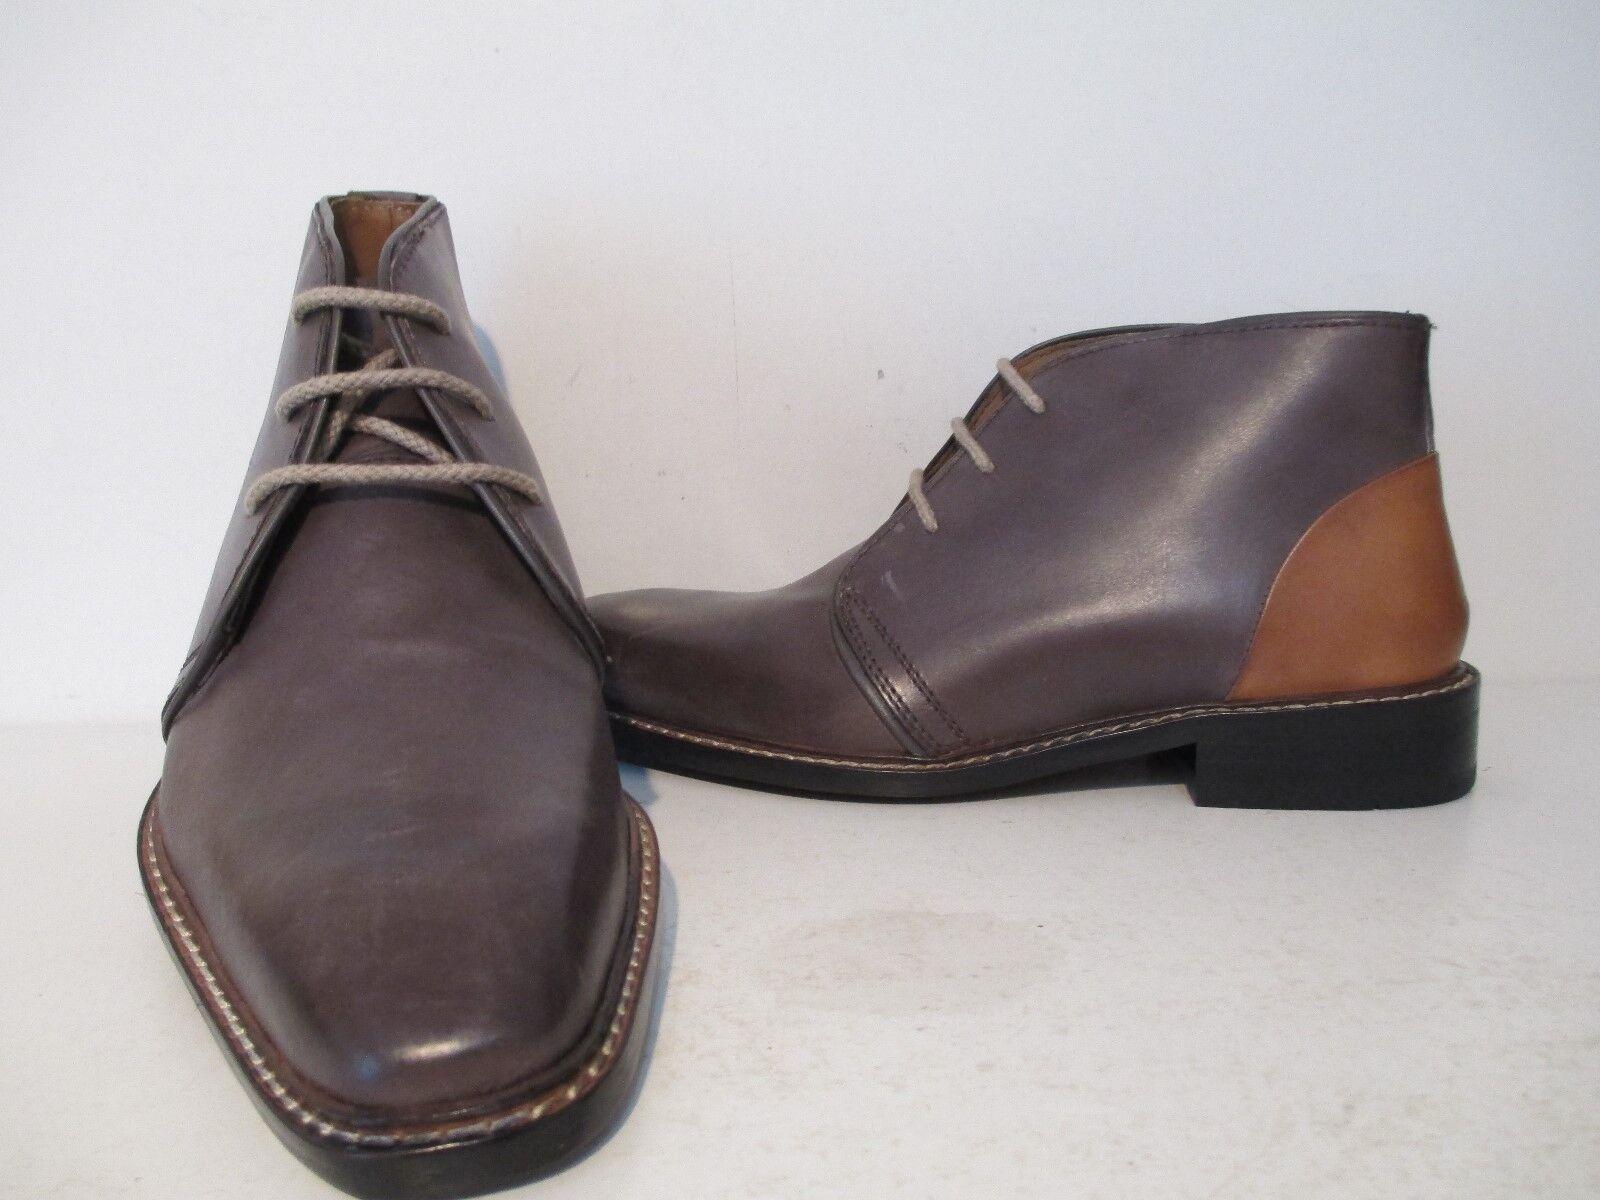 Giorgio Brutini Mens 24927 Thornton Leather Ankle Dress Boot Grey/Tan Size 7.5 M